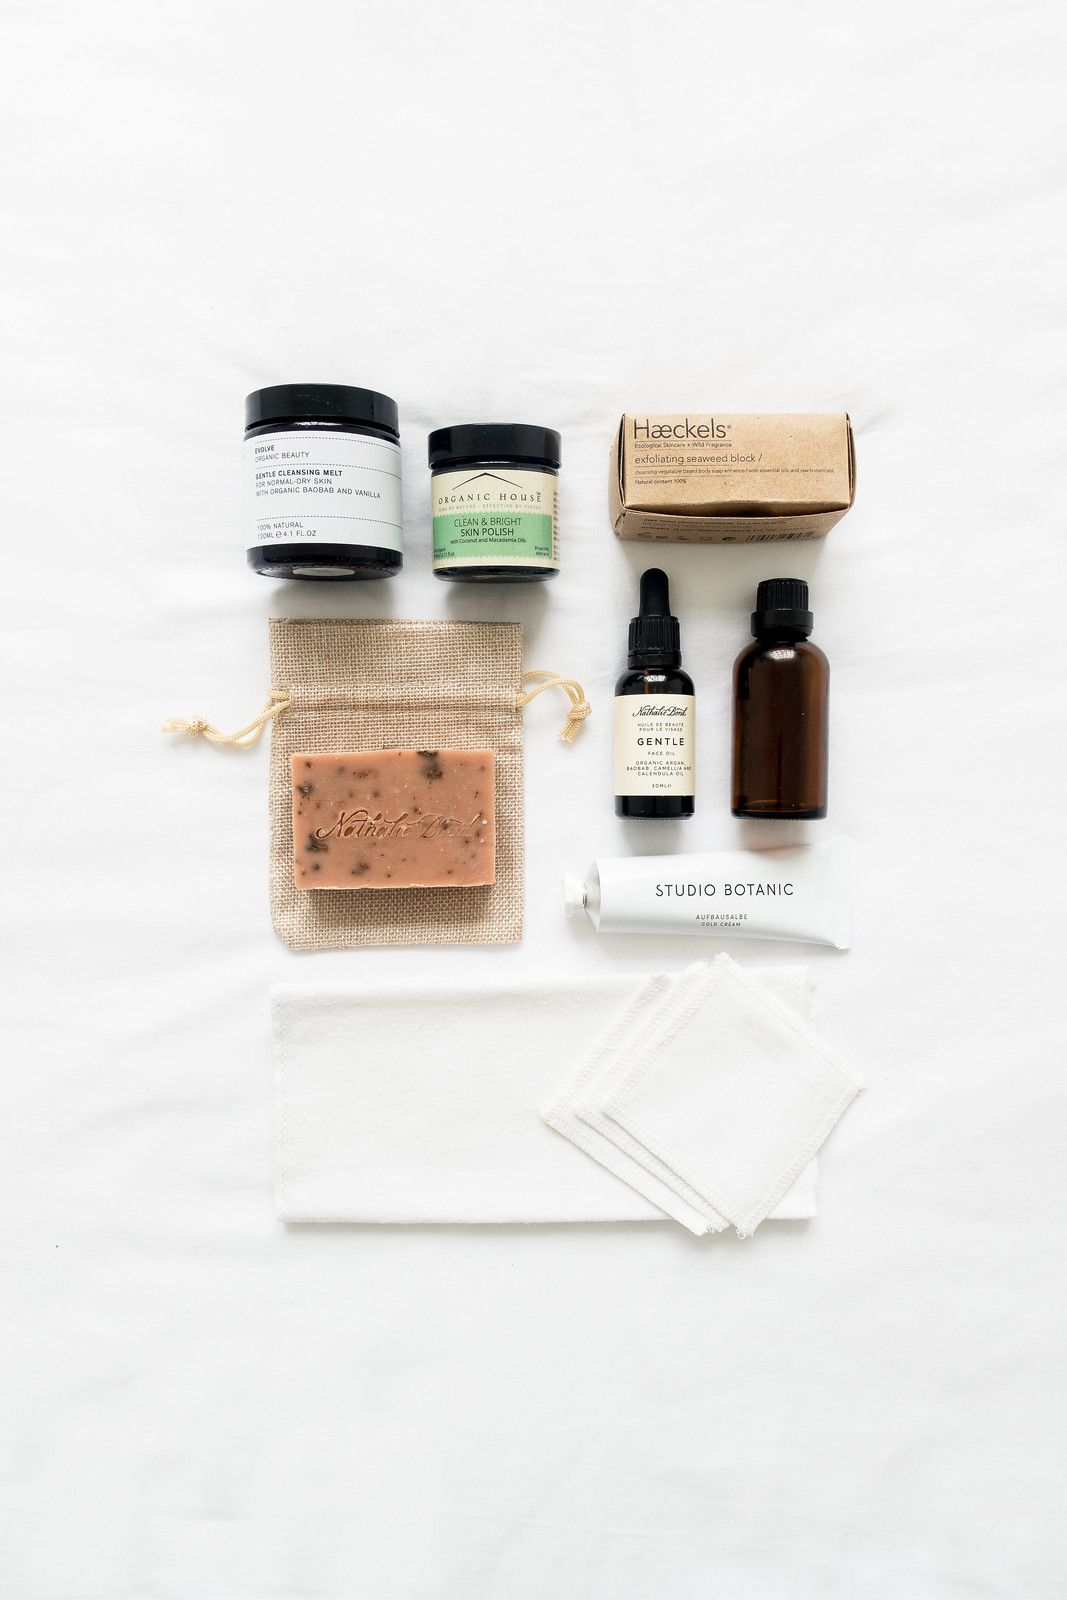 Cleansing, The Zero Waste Way Almond oil moisturizer